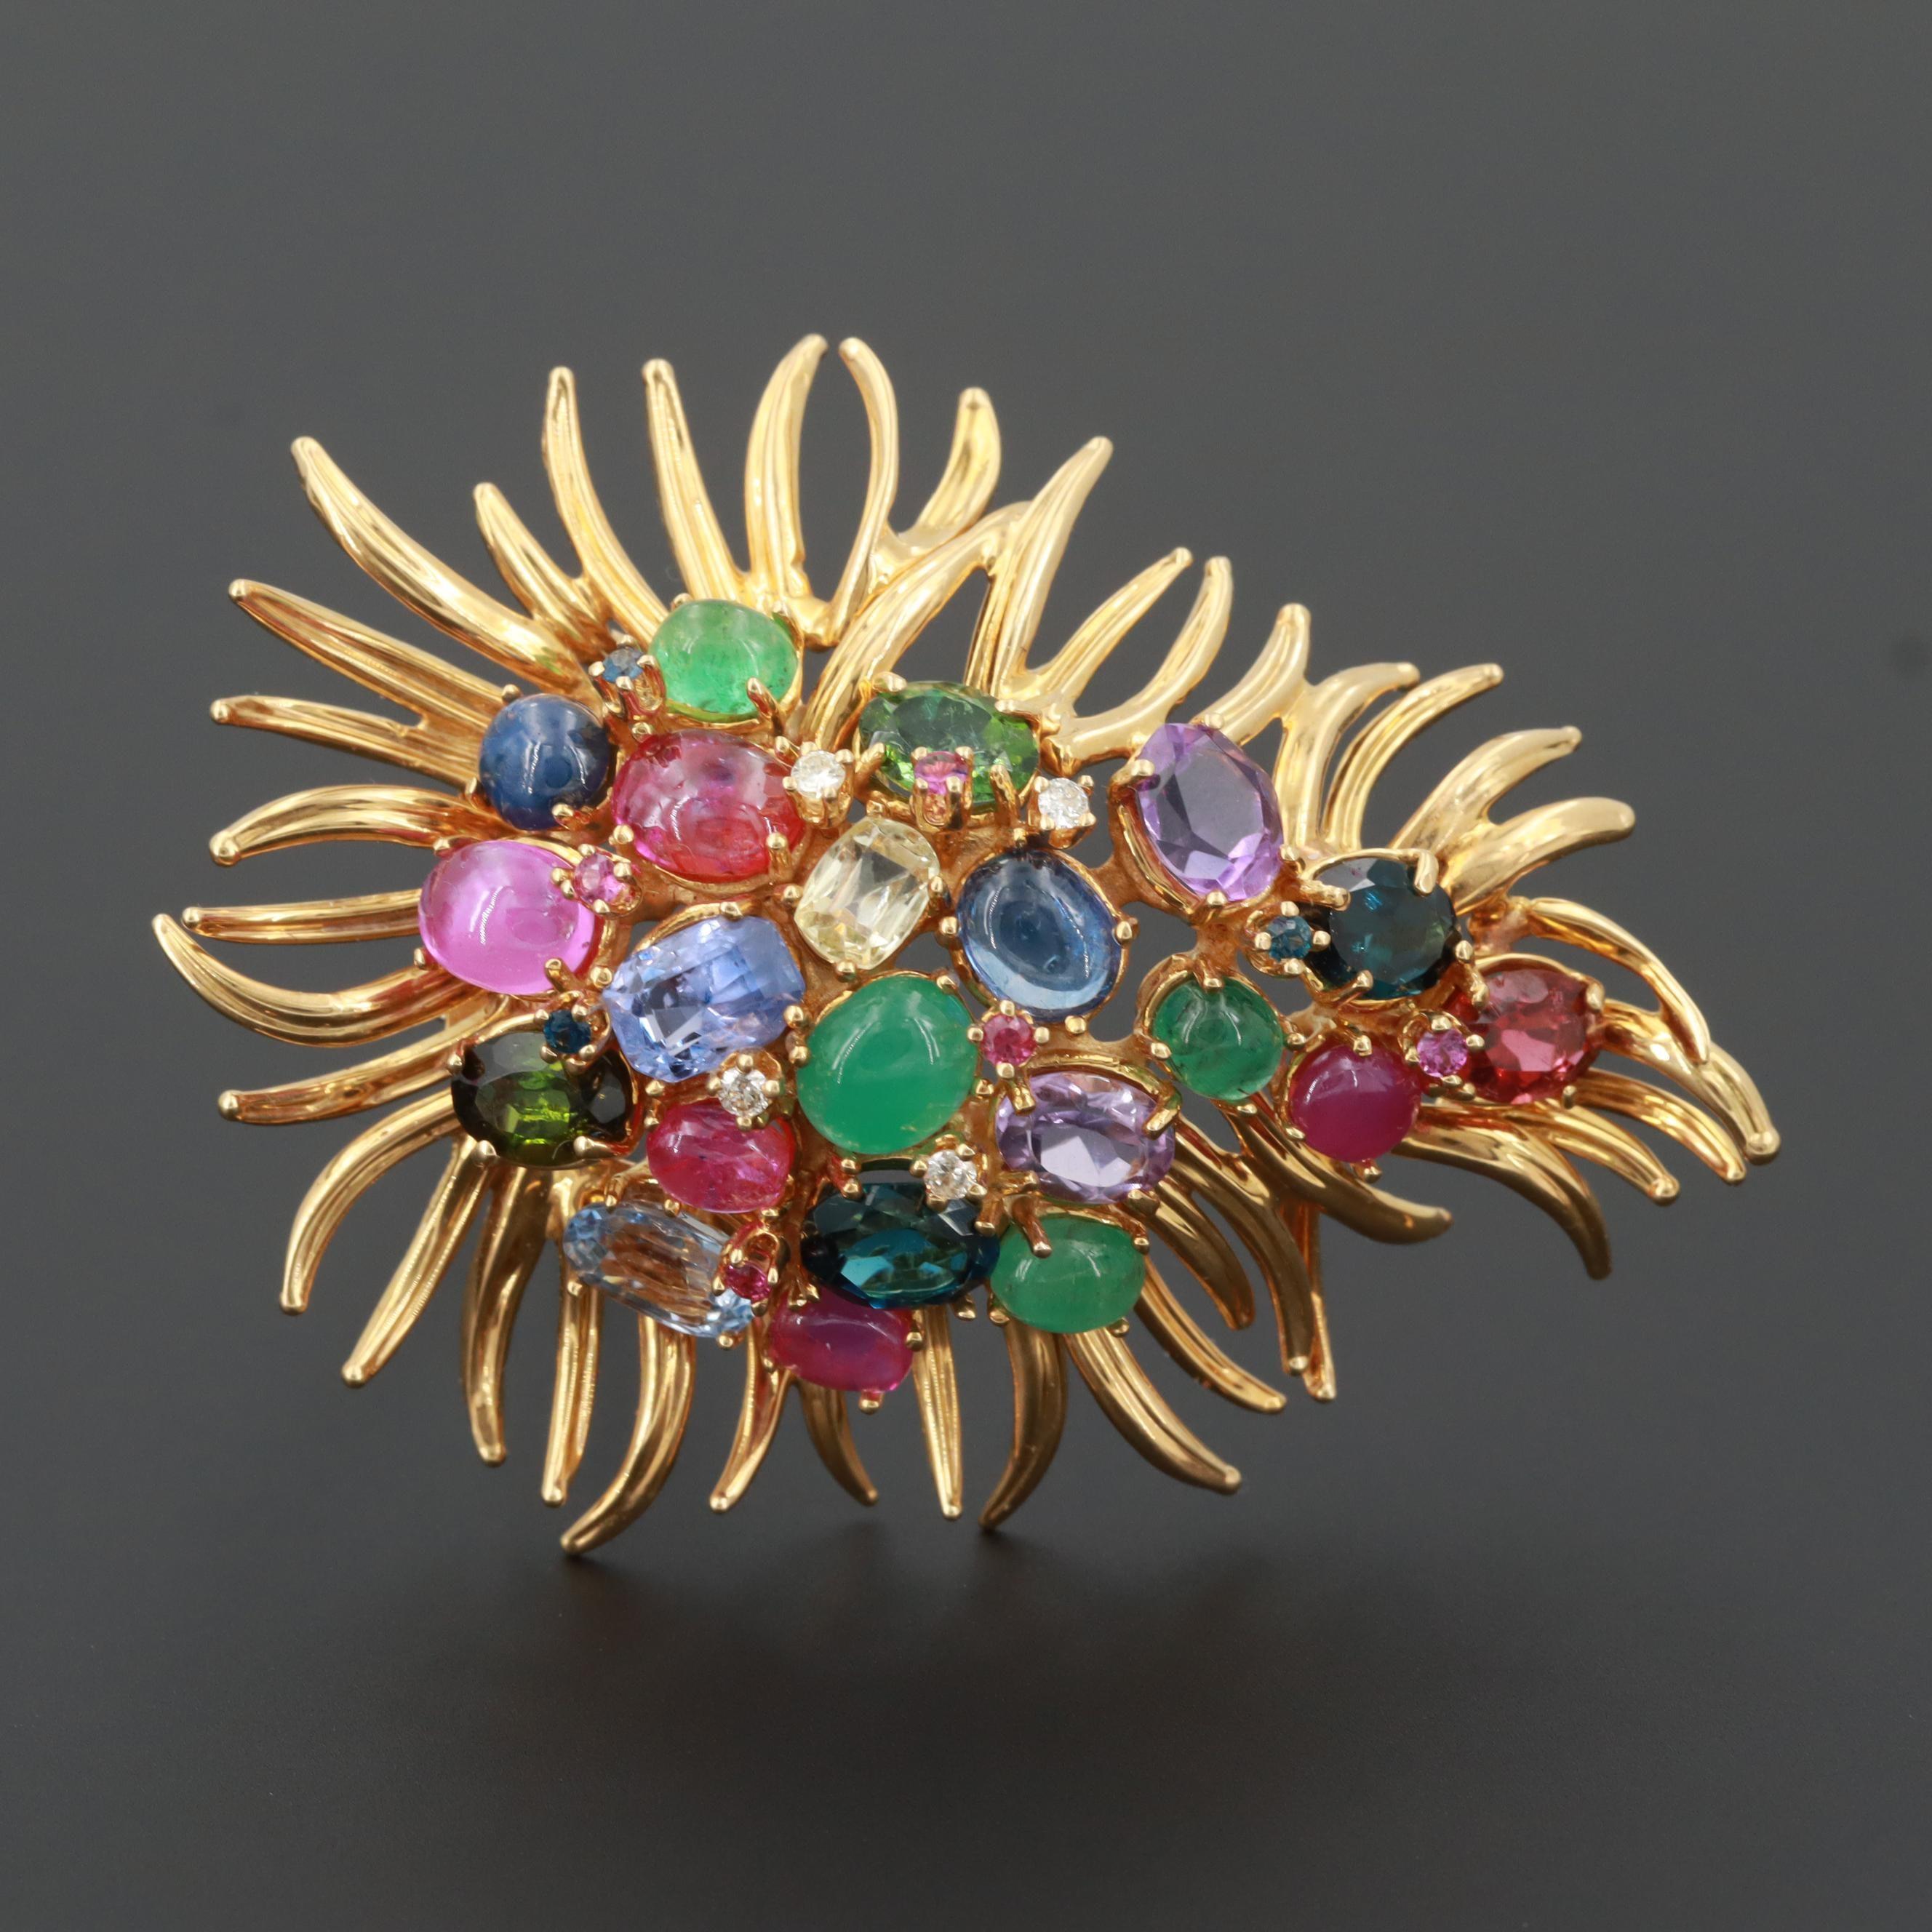 Circa 1960 Dessin Paris 18K Yellow Gold Gemstone Fur Clip Brooch with Diamonds